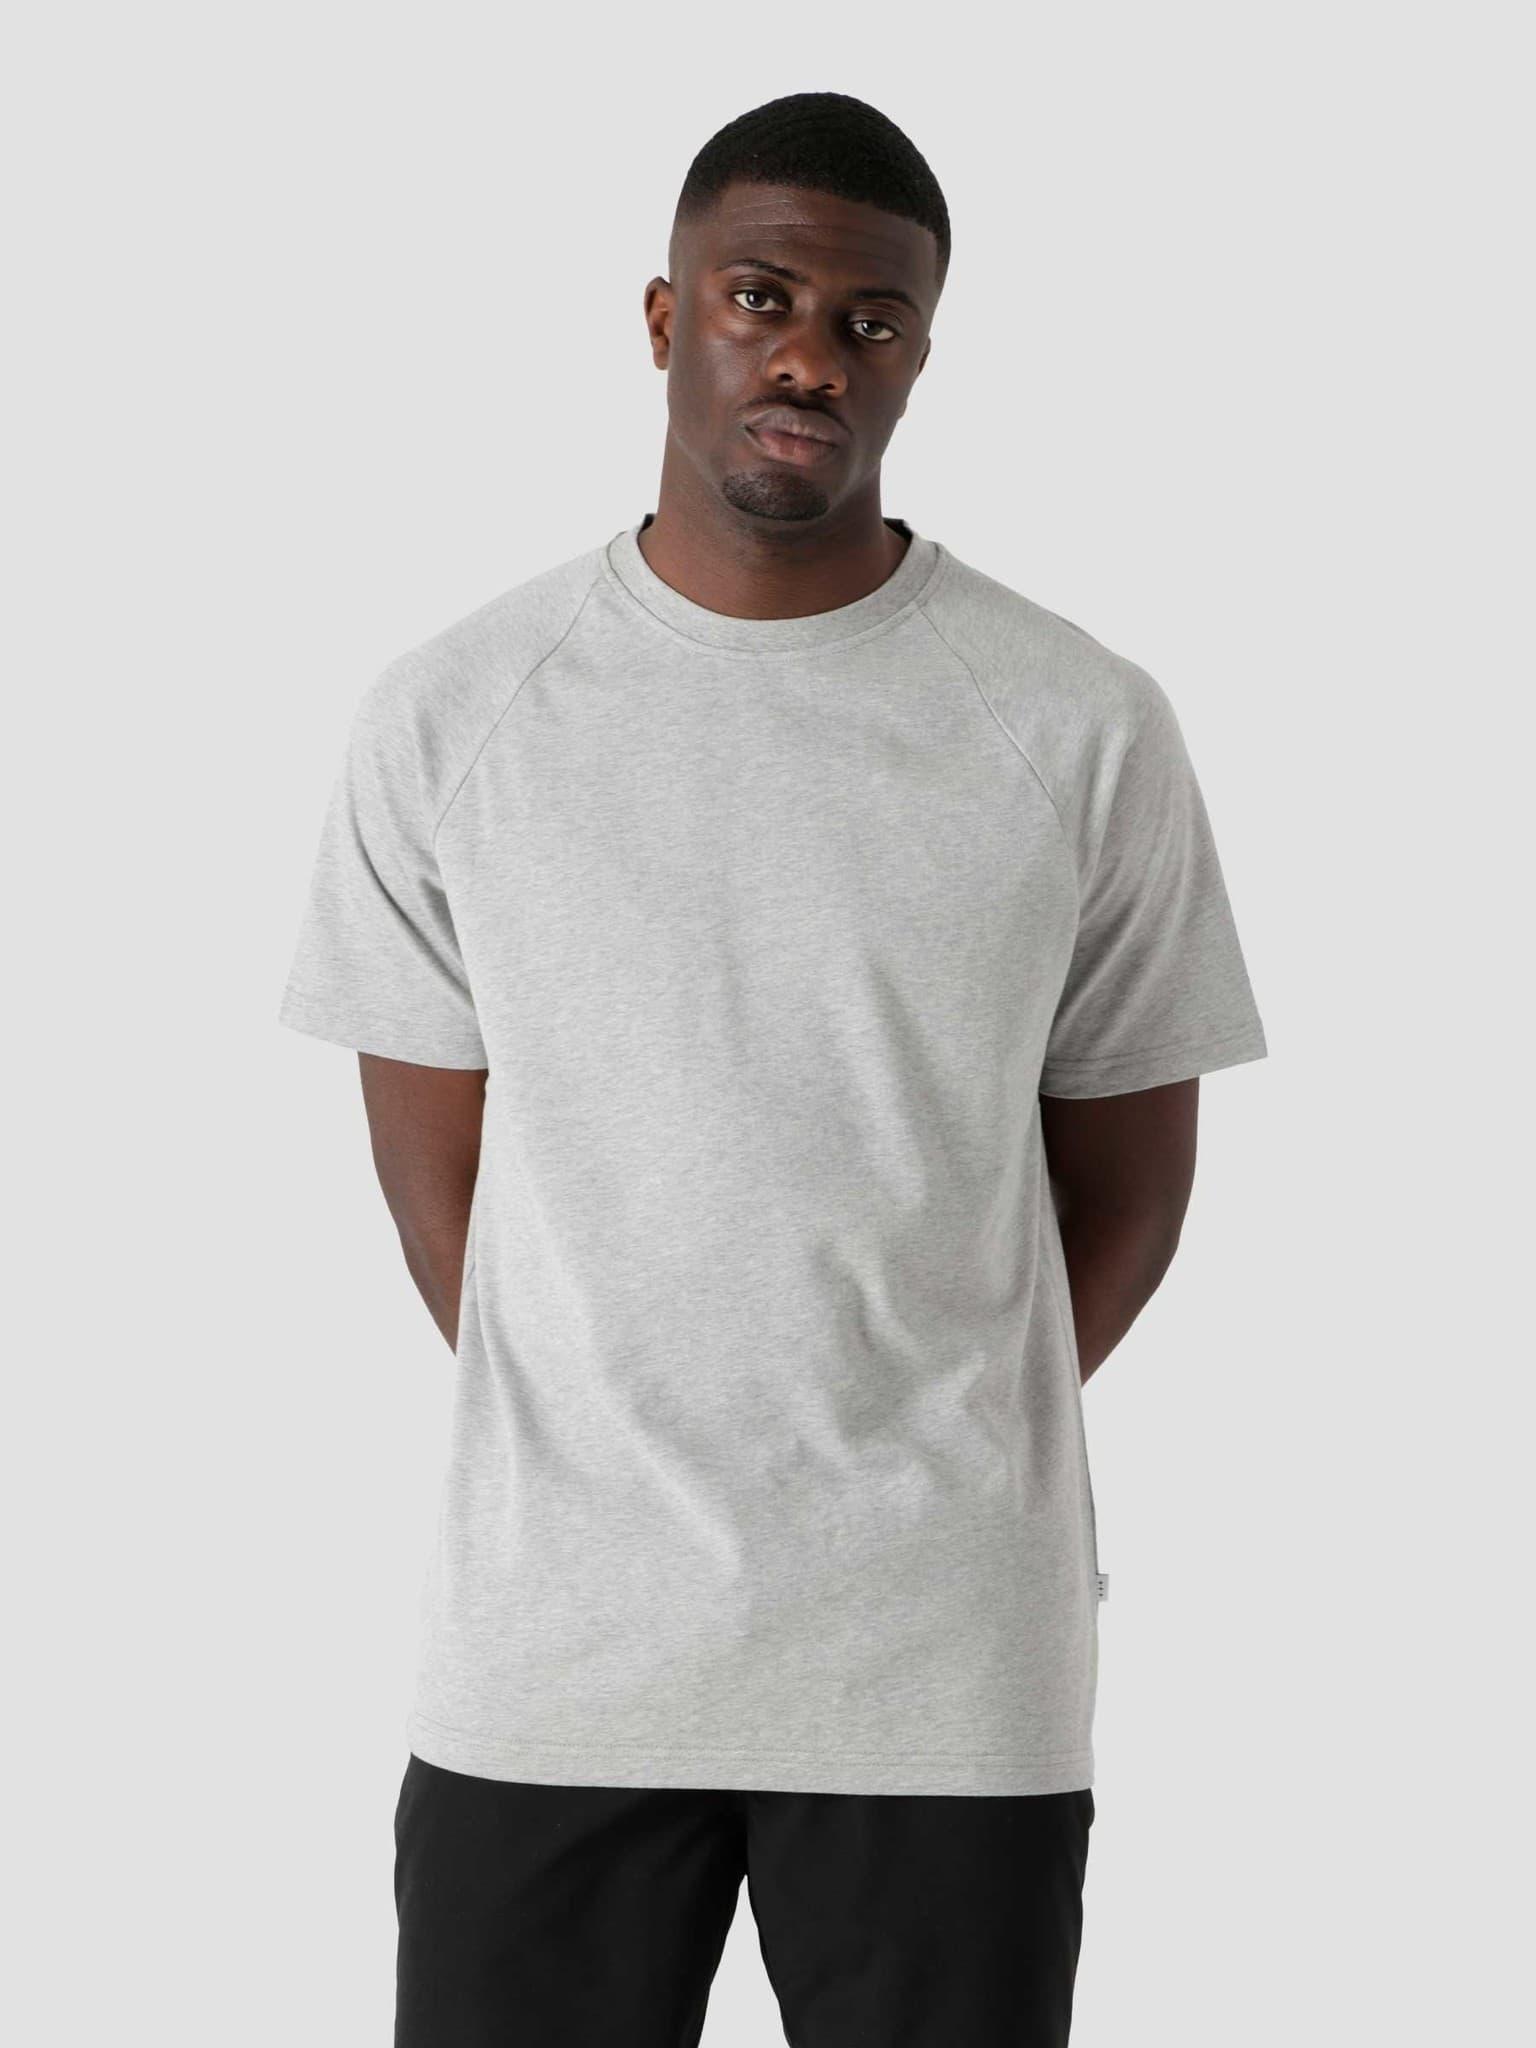 QB302 Heavy Raglan T-shirt Grey Heather